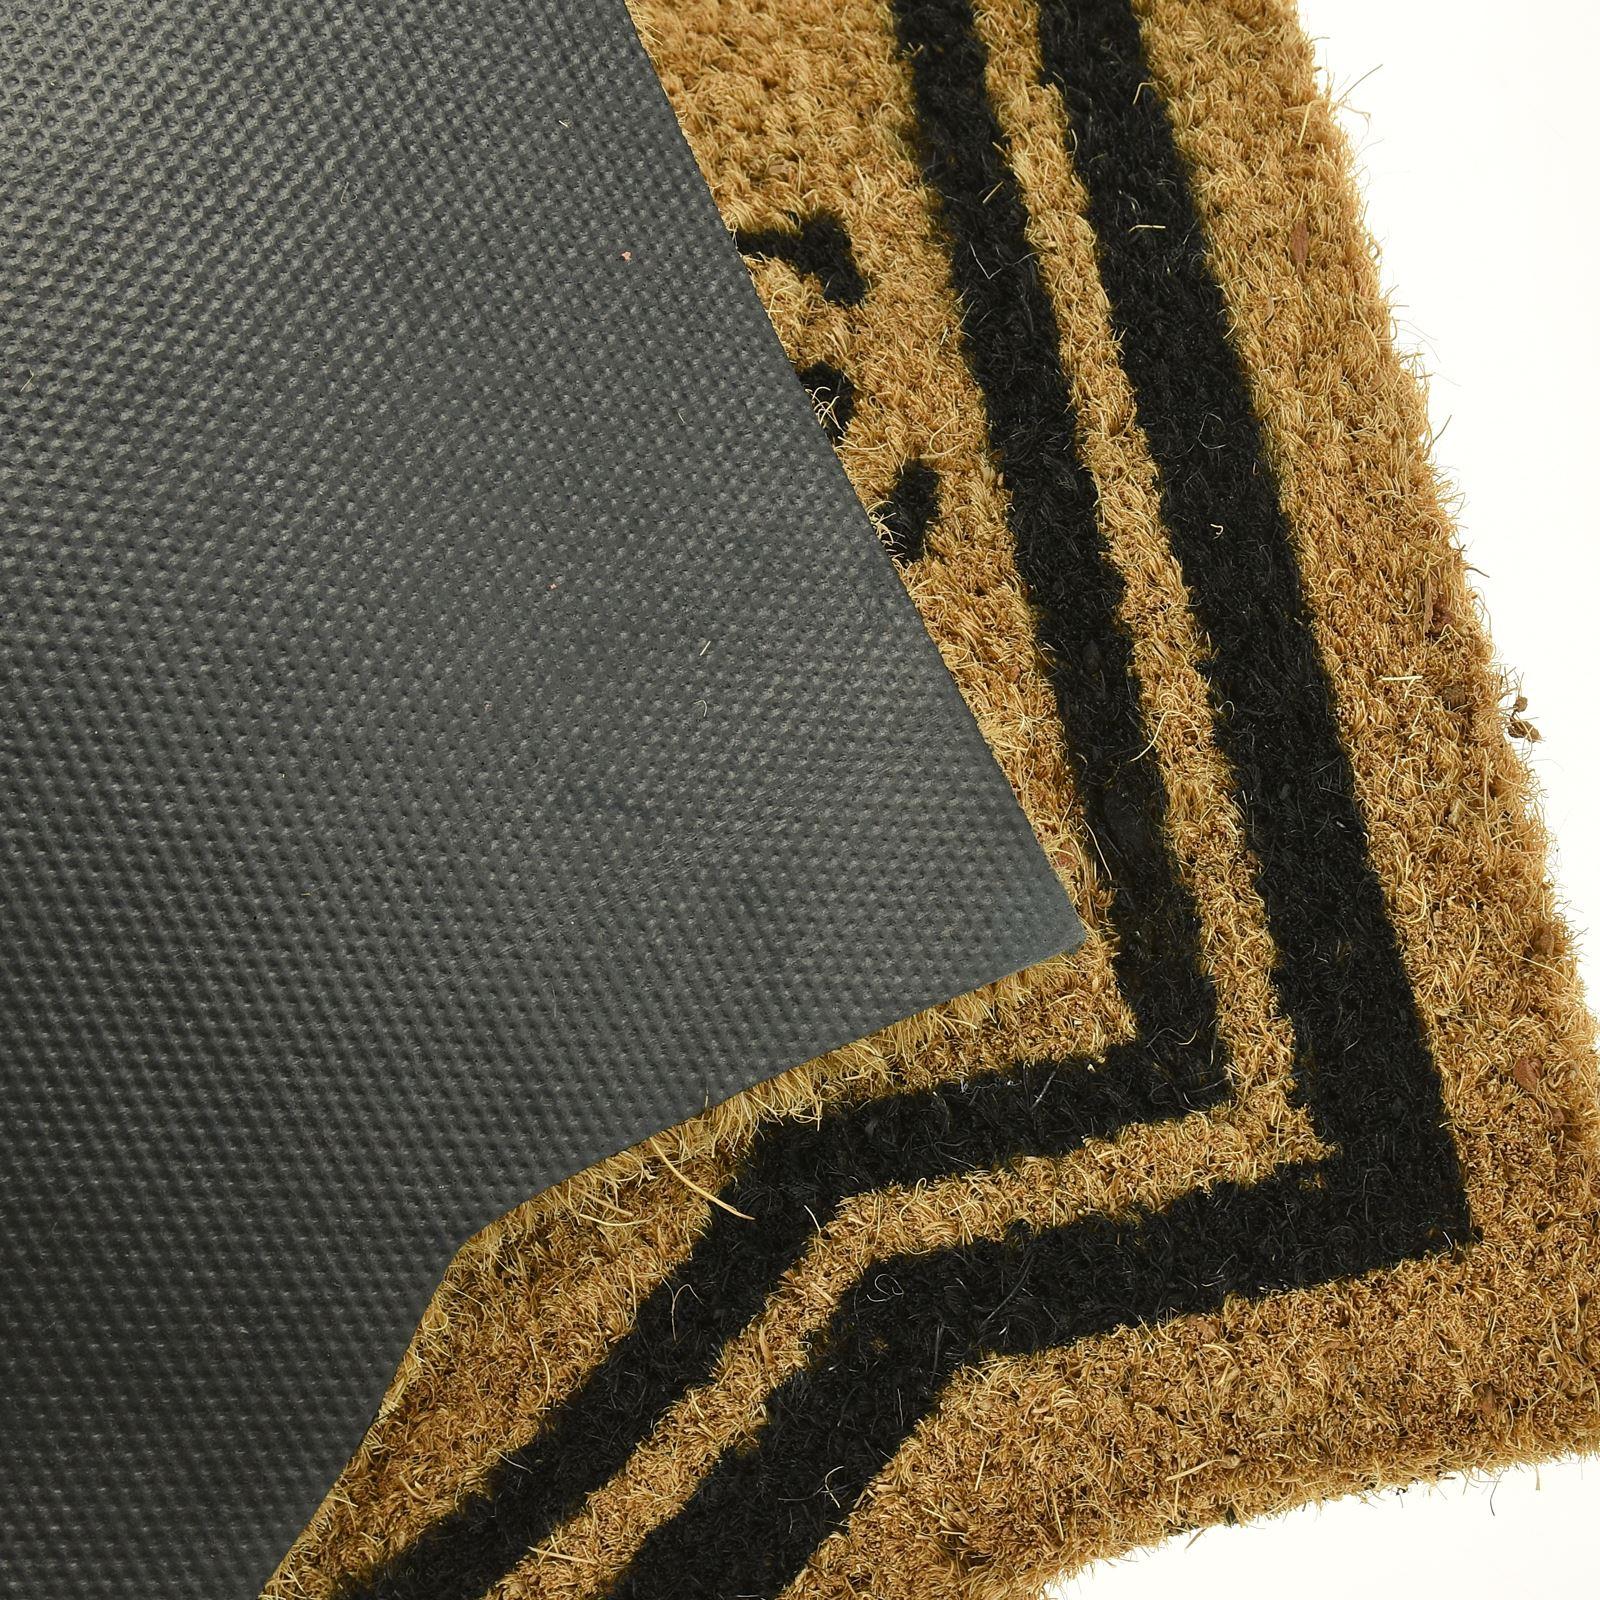 Plain-Non-Slip-Door-Mat-Tough-Natural-Coir-PVC-Back-Welcome-Doormat-40-x-60cm miniatura 118